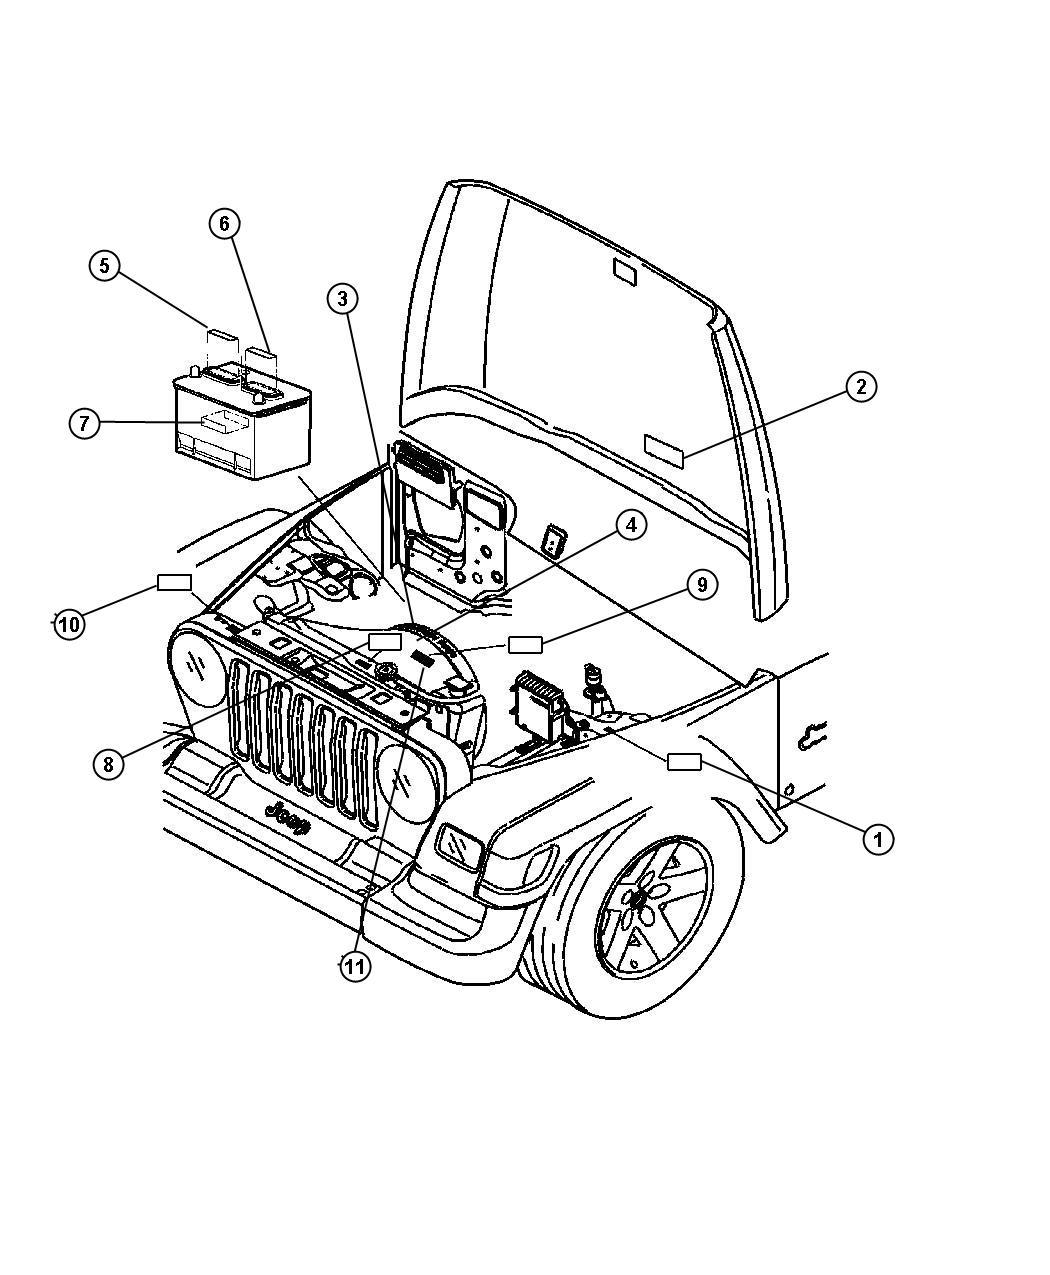 jeep wrangler engine compartment diagram